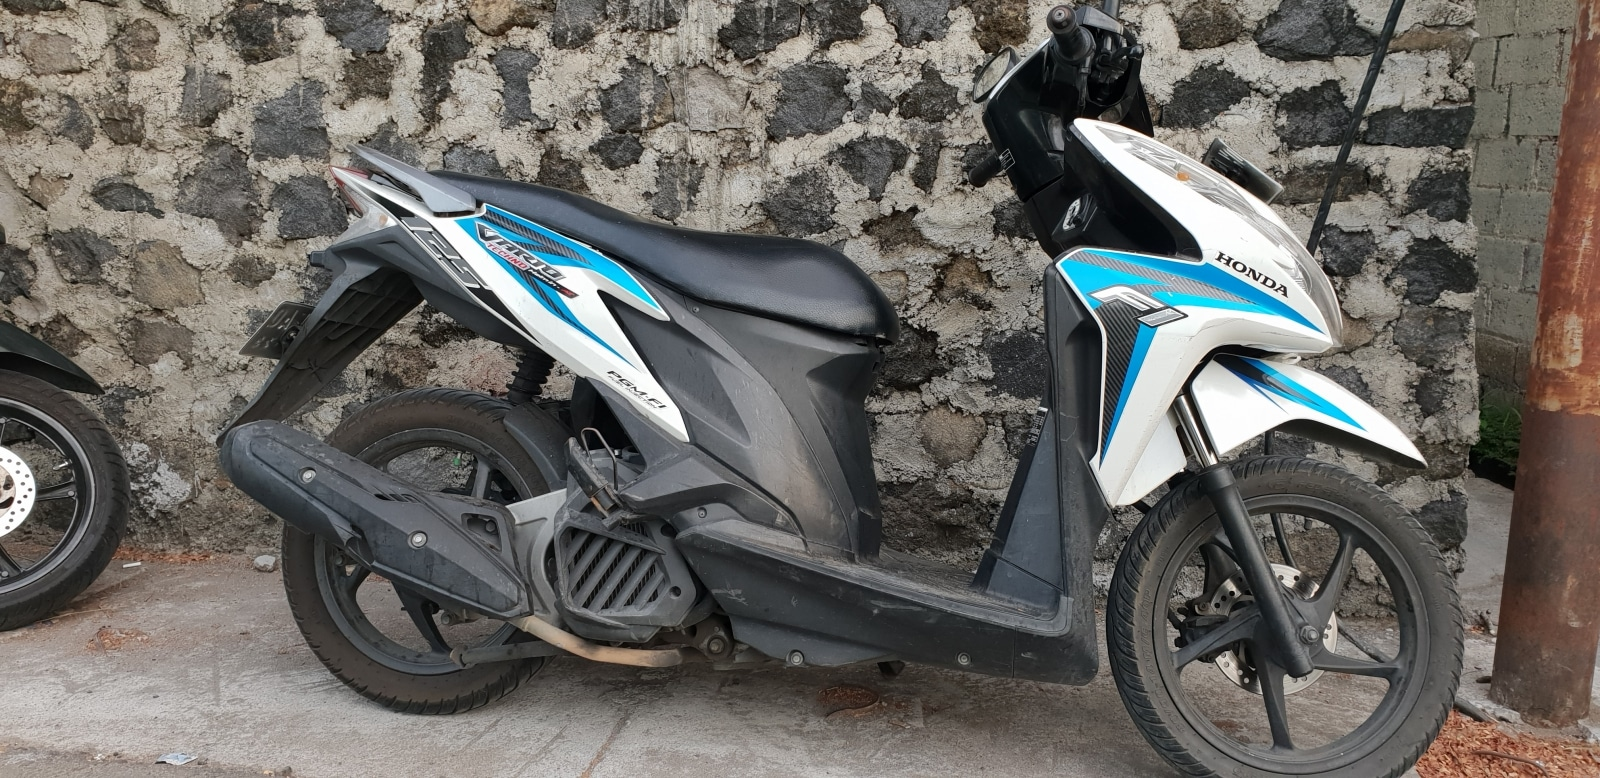 Honda Vario - Bali Holiday Secrets